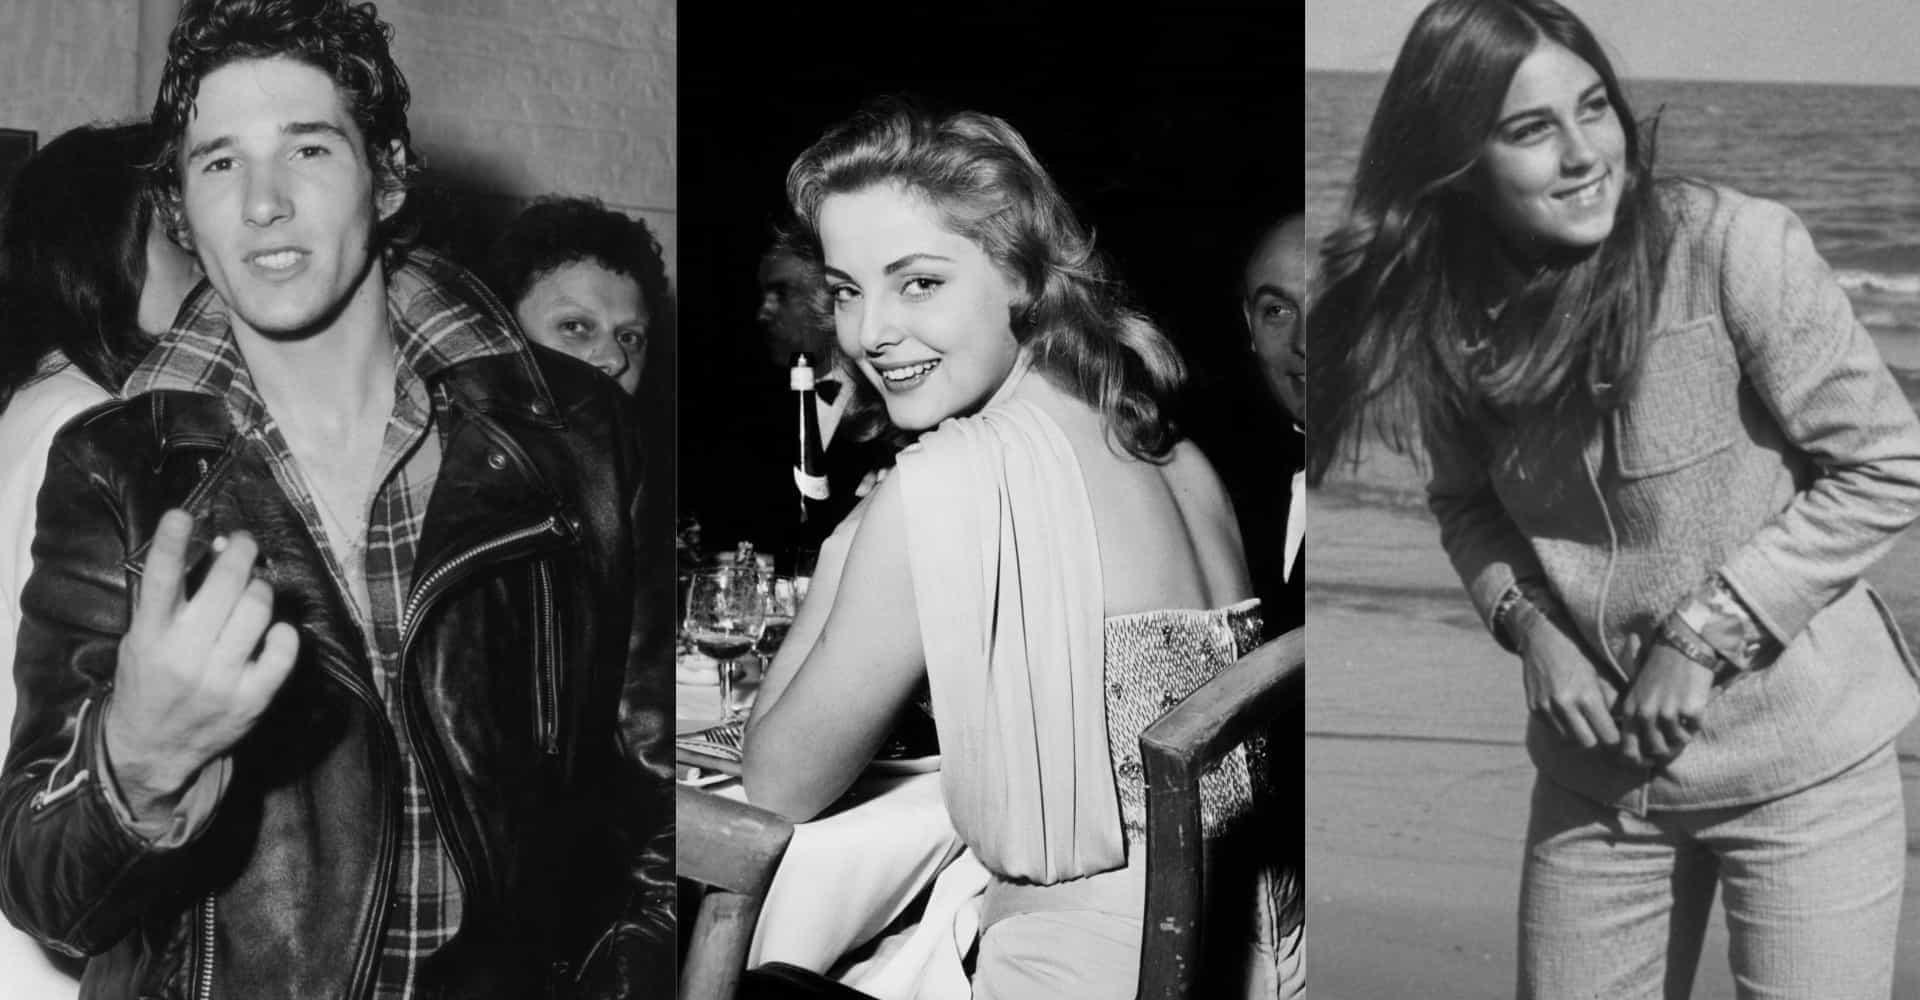 Virna Lisi, Elton John e Robert De Niro, sapresti riconoscerli?